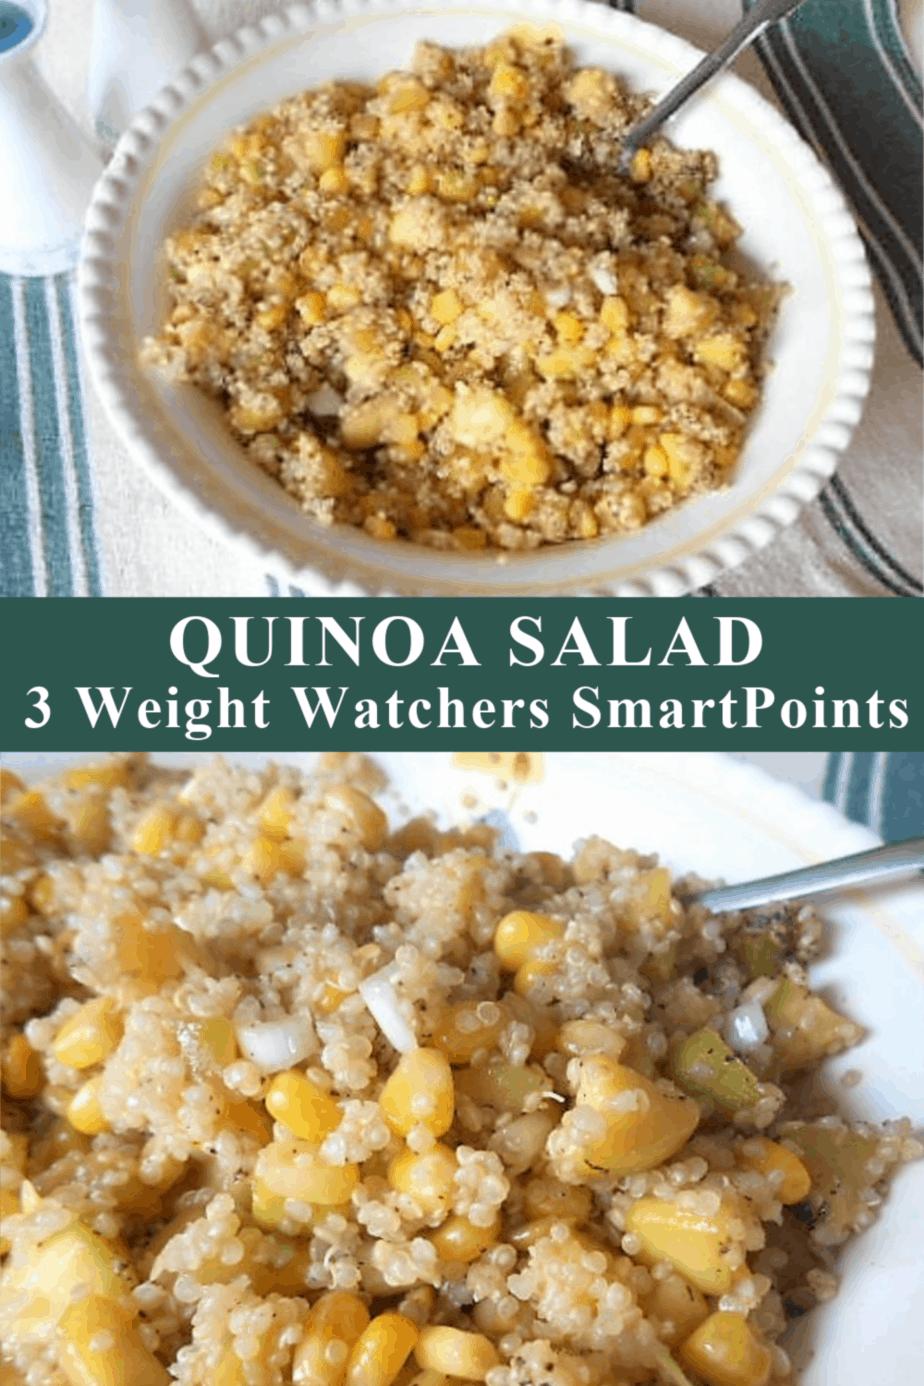 Delicious Quinoa Salad Recipe: 3 Weight Watchers SmartPoints